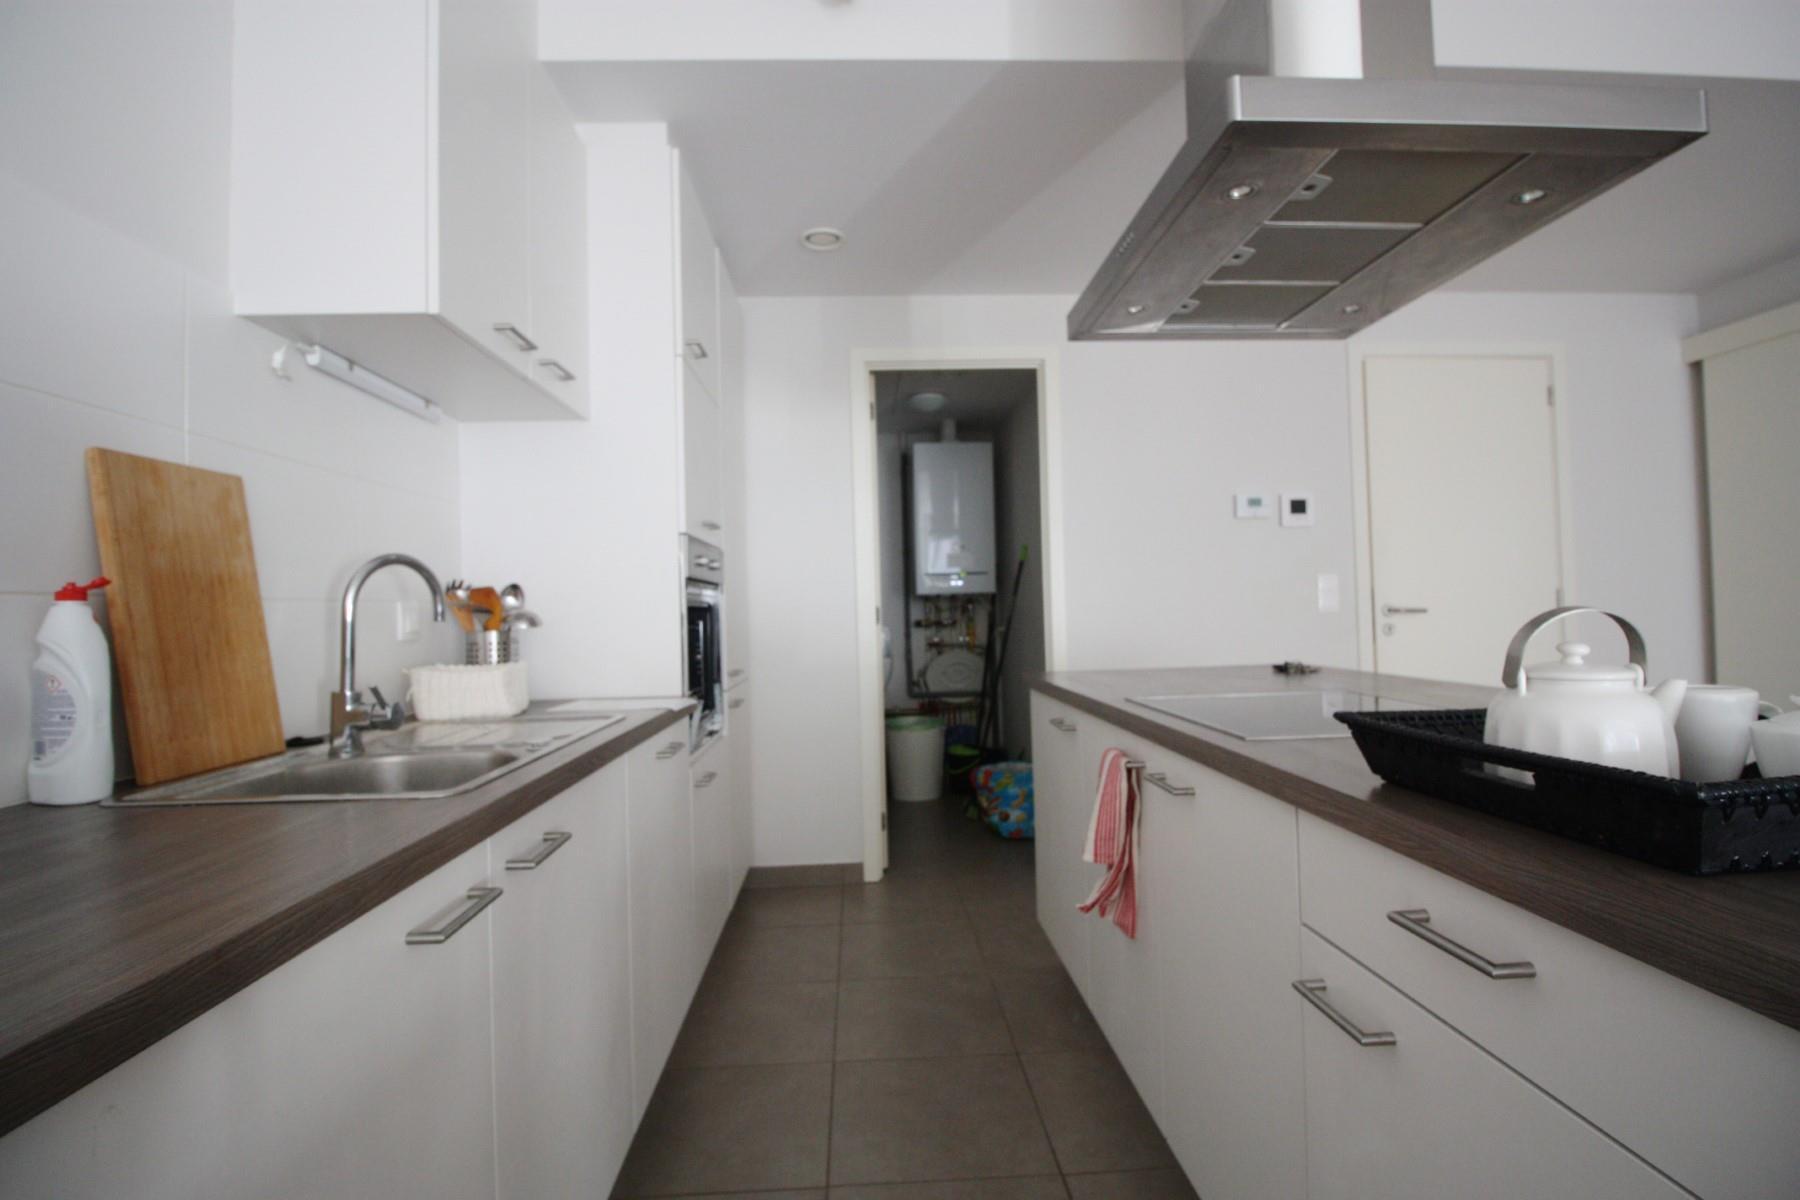 Flat - Etterbeek - #4527457-11